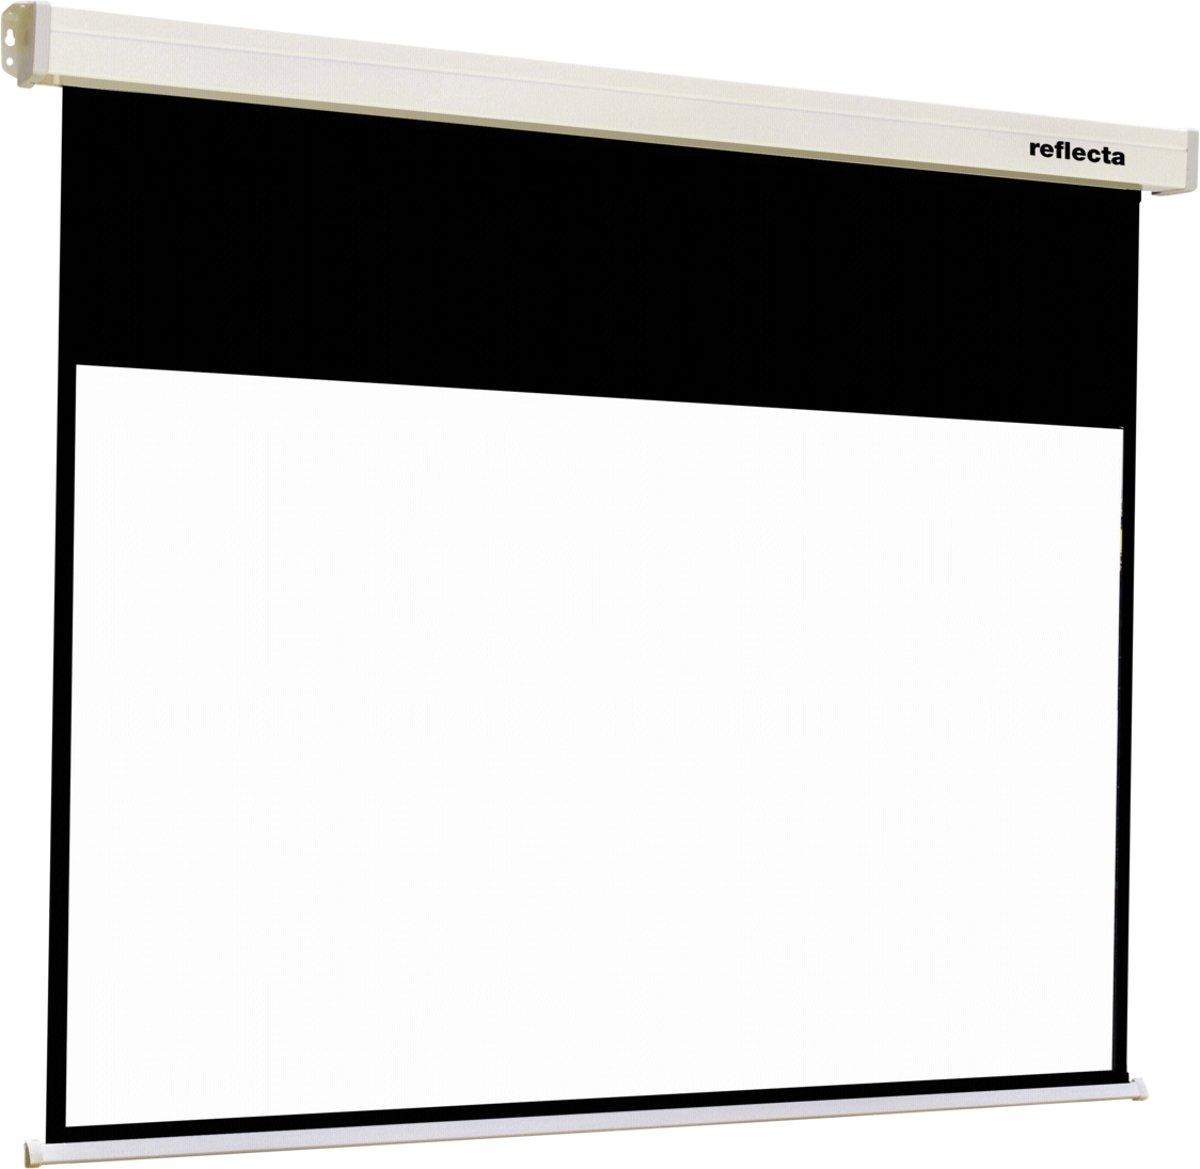 Reflecta Screen Crystal-L.200X159 Cm kopen